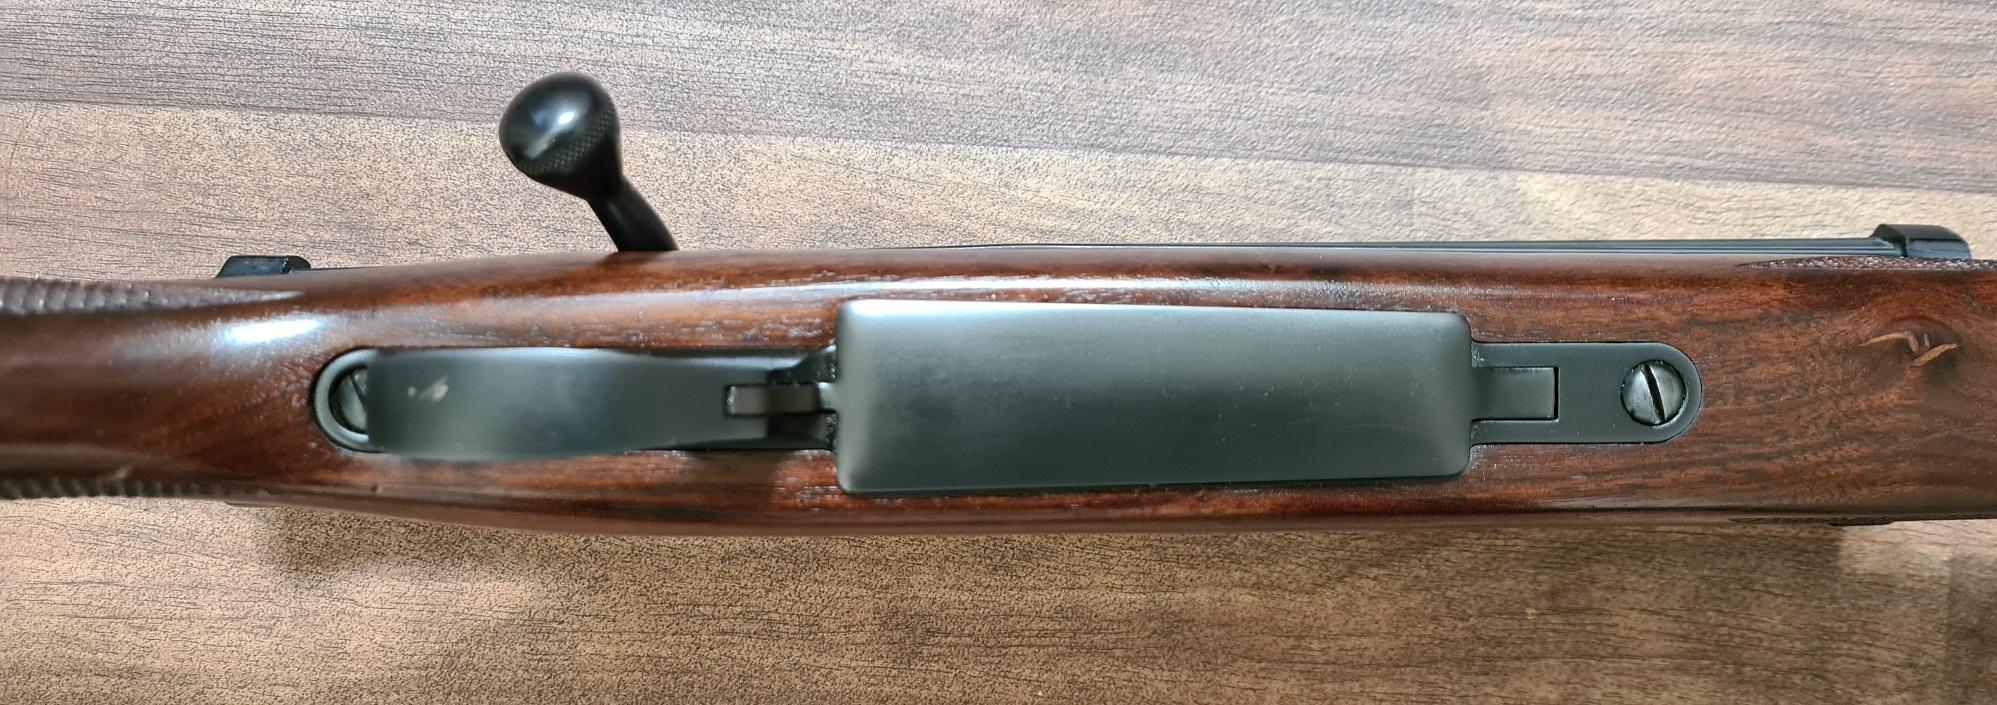 Weatherby Vanguard Kaliber .300 Weatherby Magnum